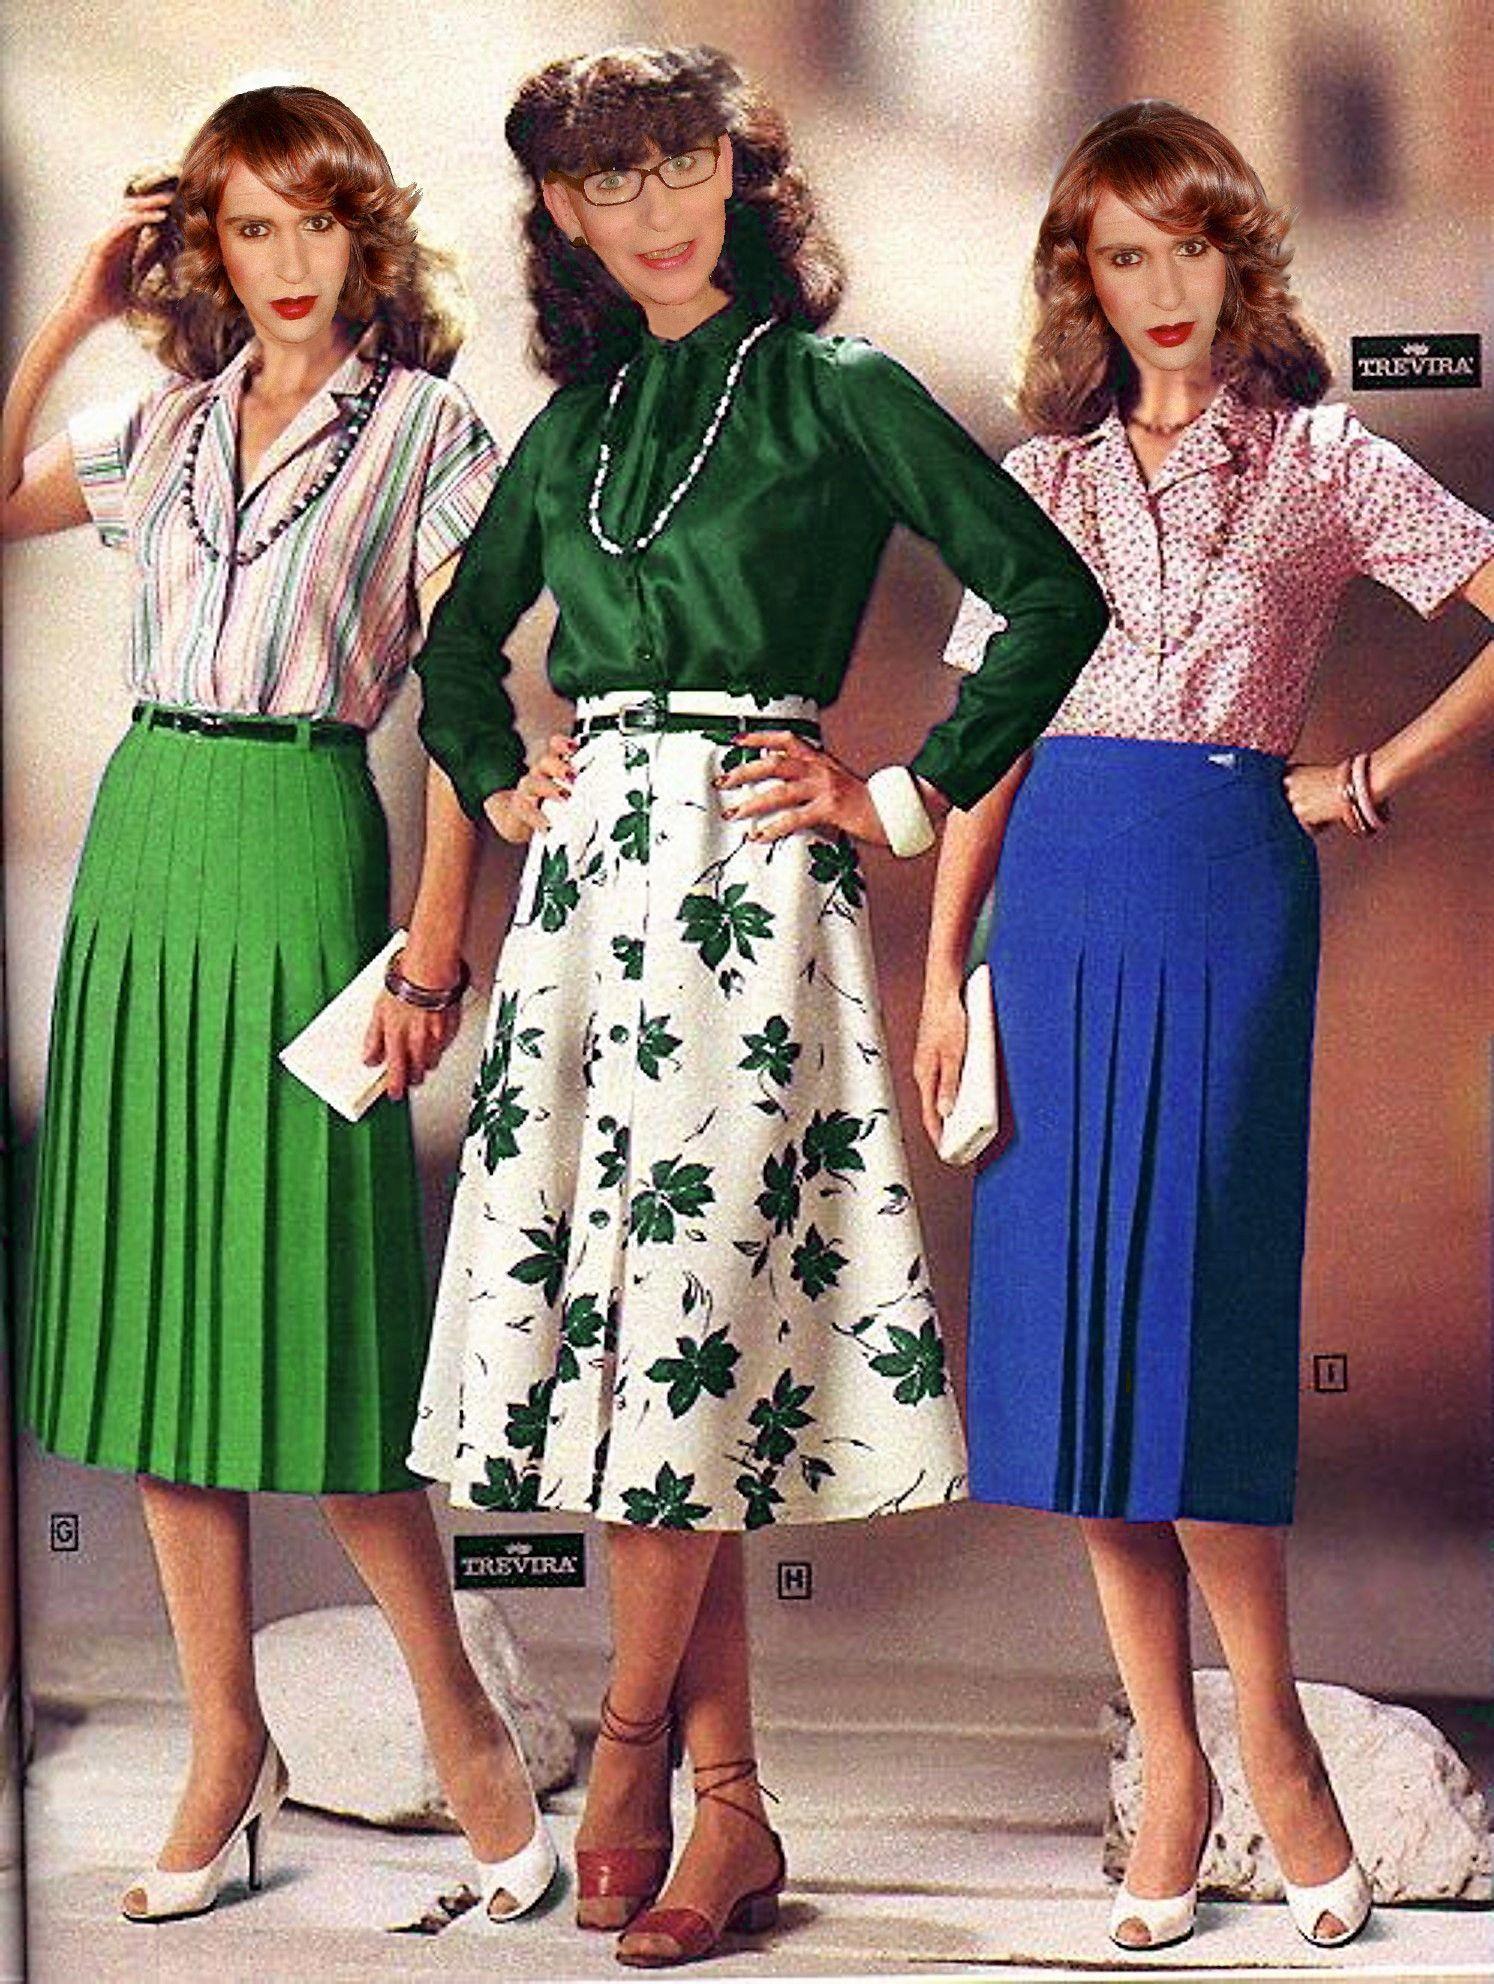 70ies Fashion 70ies Skirts 70er Jahre Mode 70er Jahre Rocke